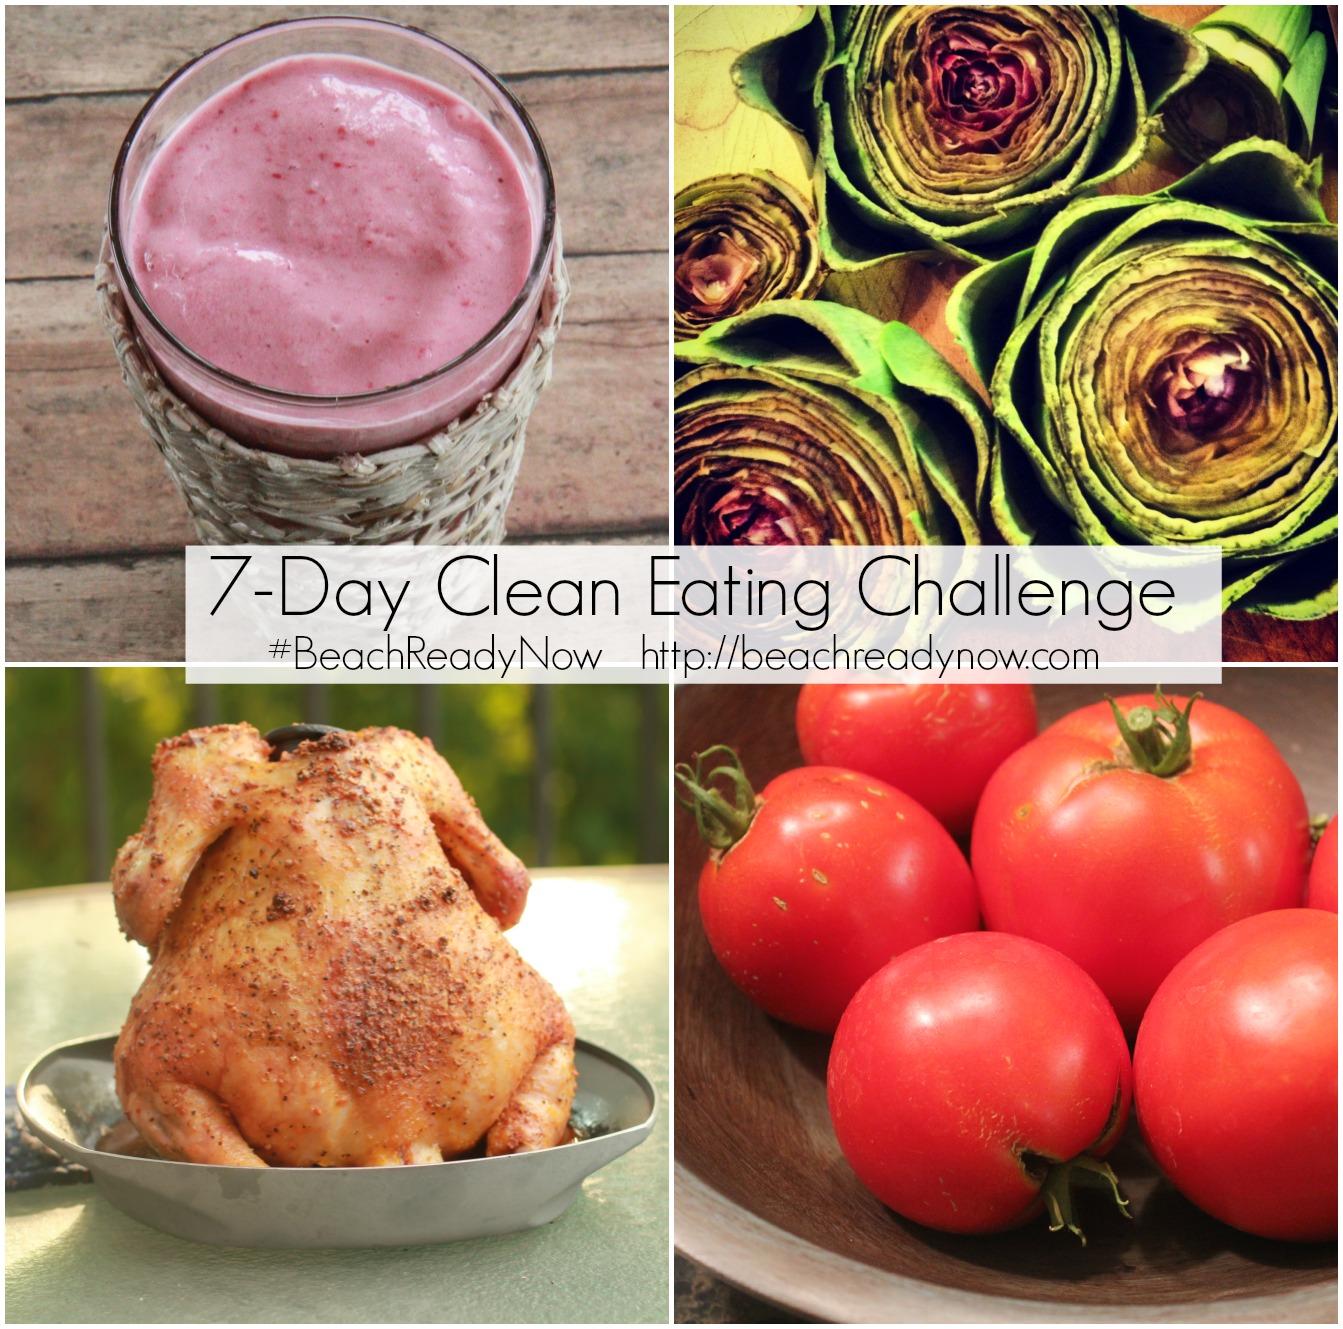 7-Day Clean Eating Challenge #BeachReadyNow